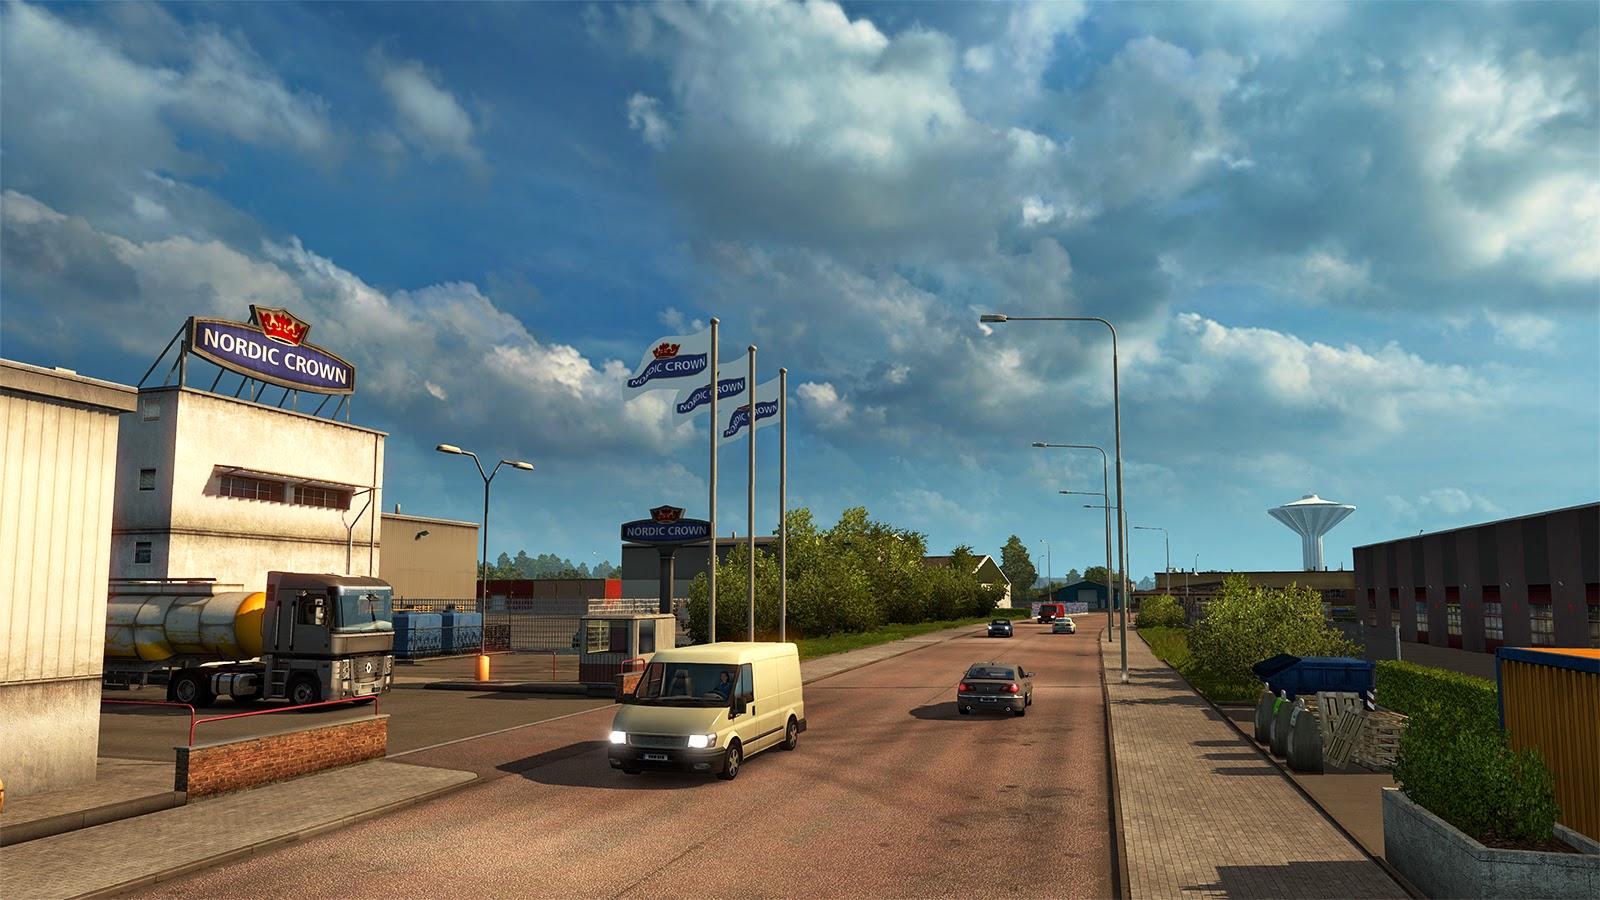 Obrazem: Městečko Örebro v Euro Truck Simulator 2 105674